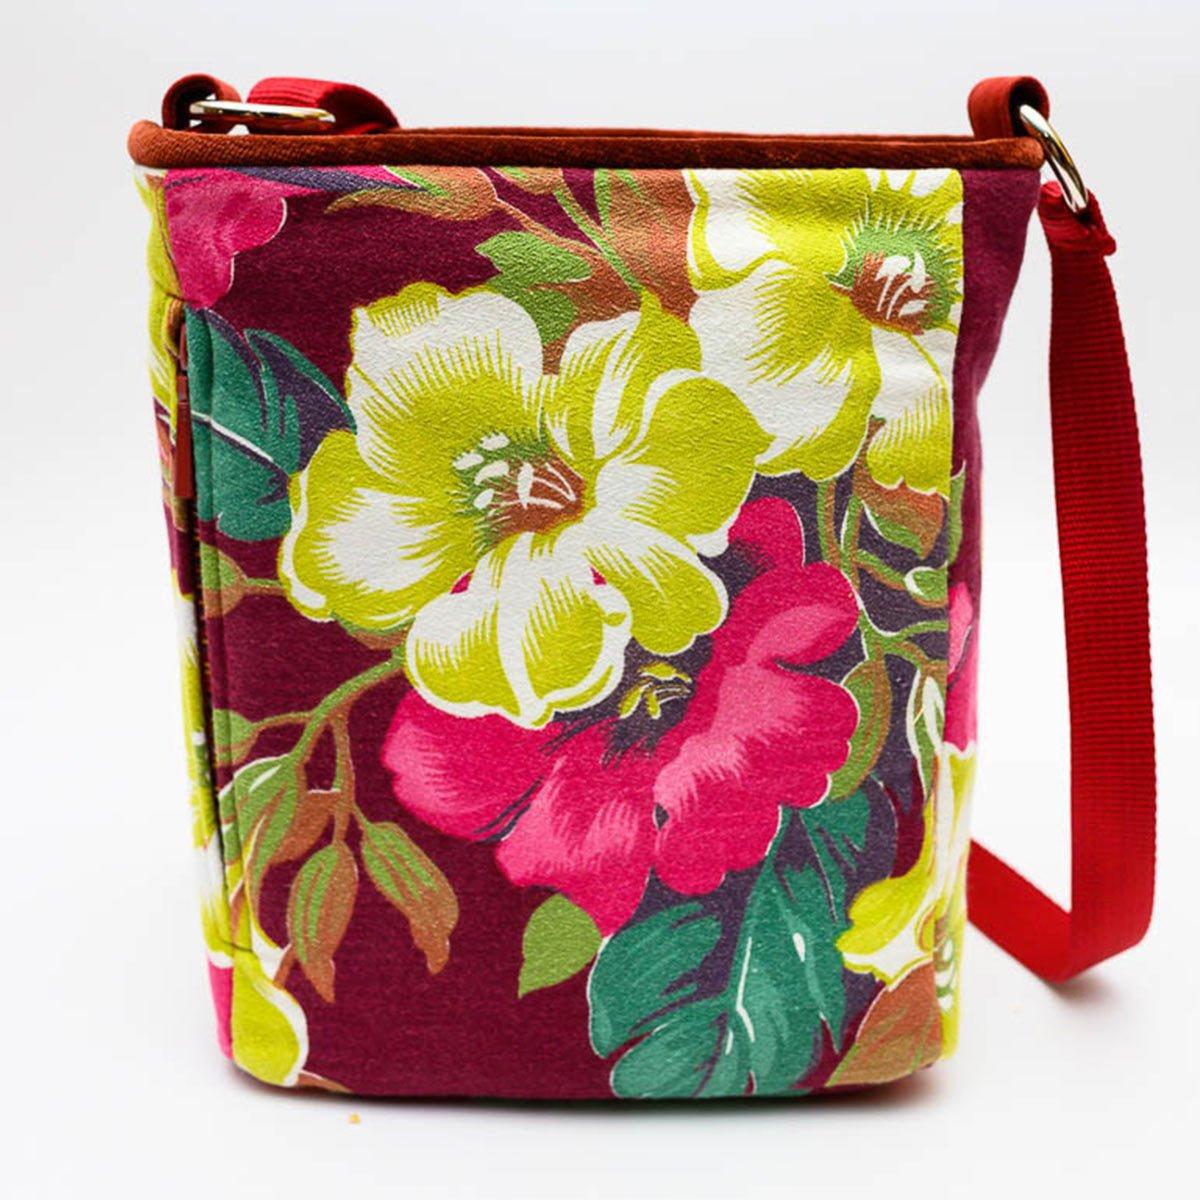 crossbody_bag_hibiscus_motif_on_magenta-MLP_6196